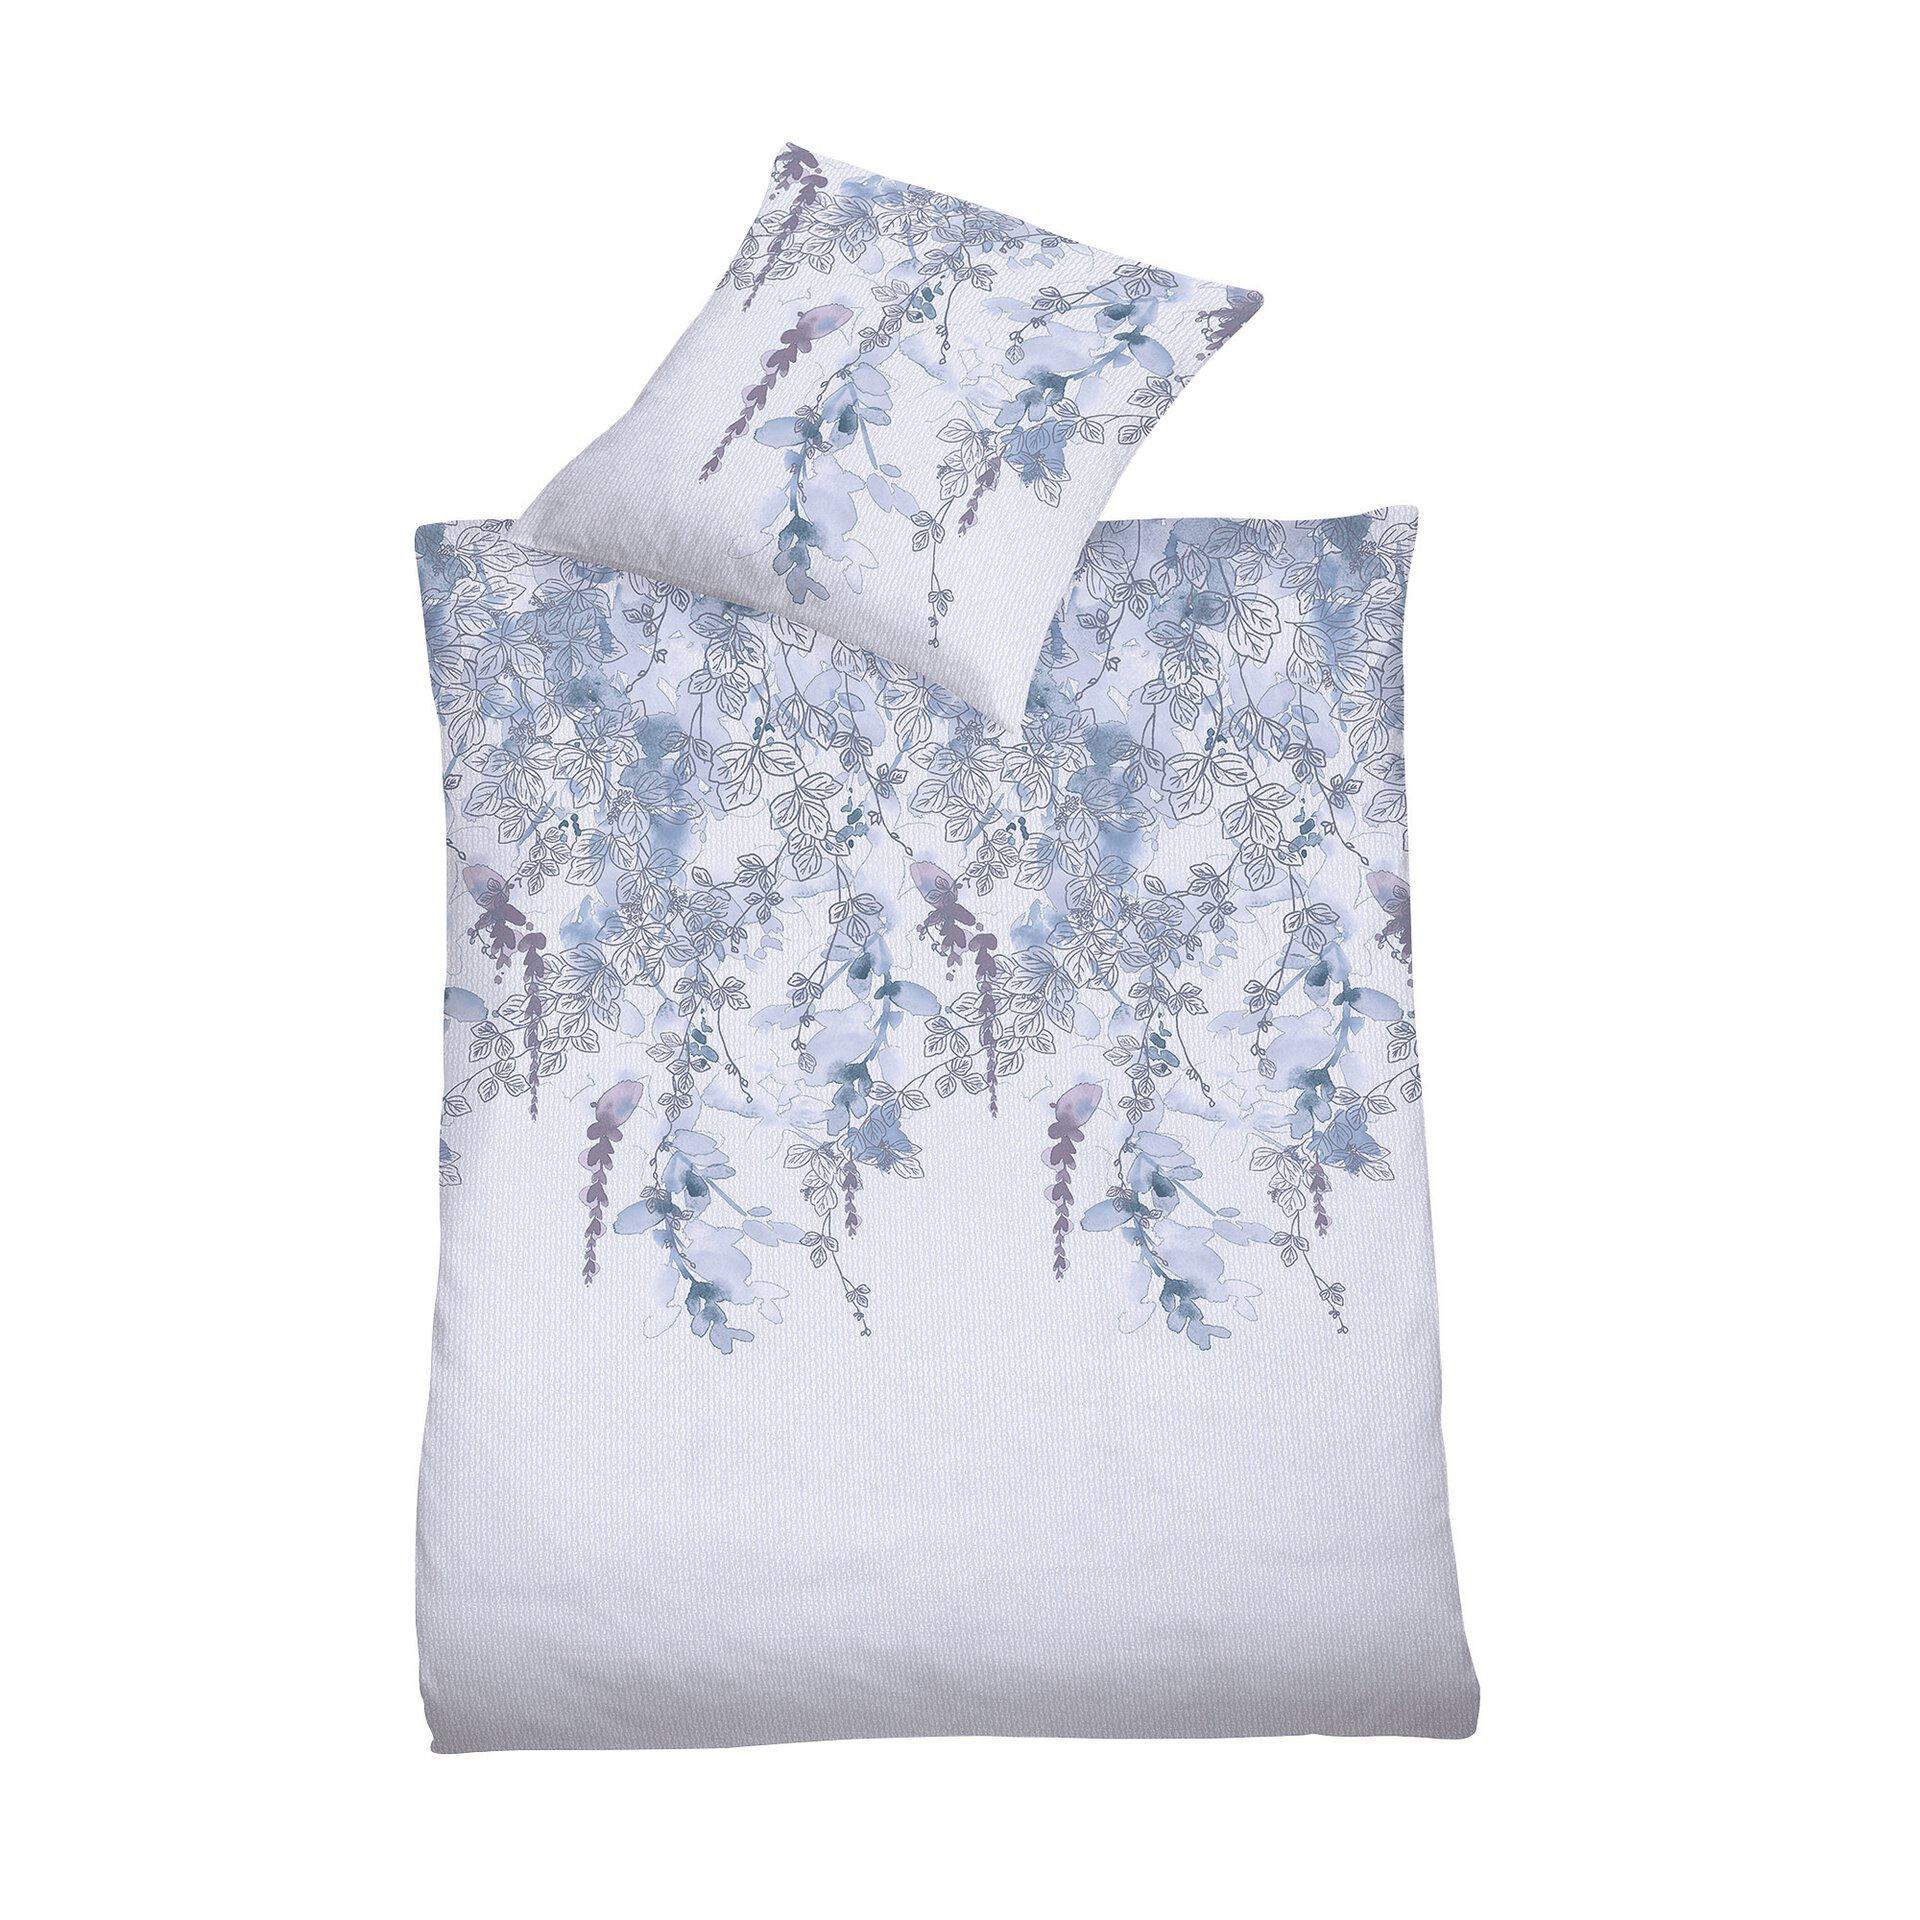 Bettwäsche Daily cotton Schlafgut Textil 135 x 200 cm